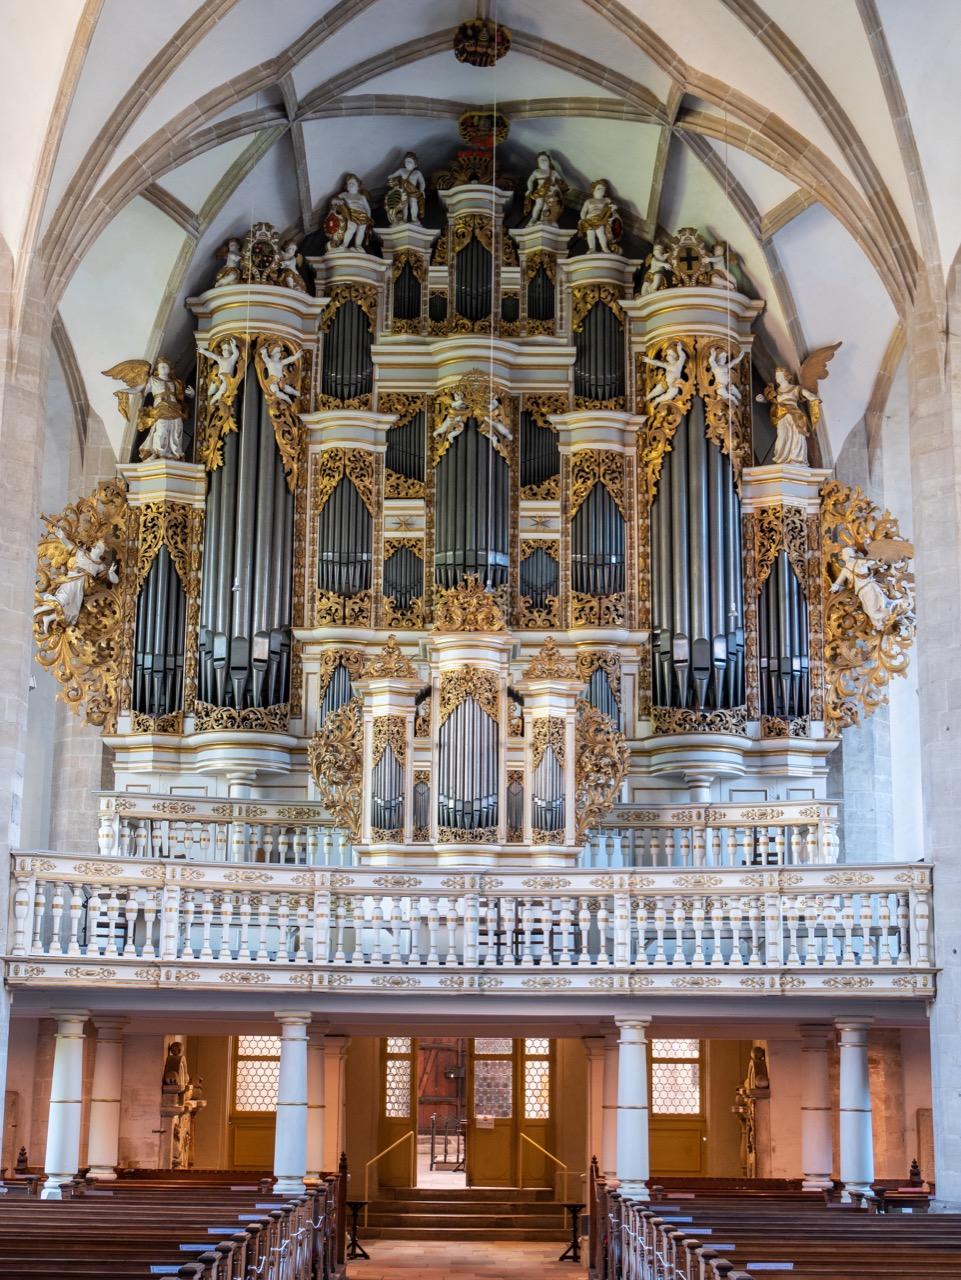 Orgel mit barockem Prospekt (um 1700)